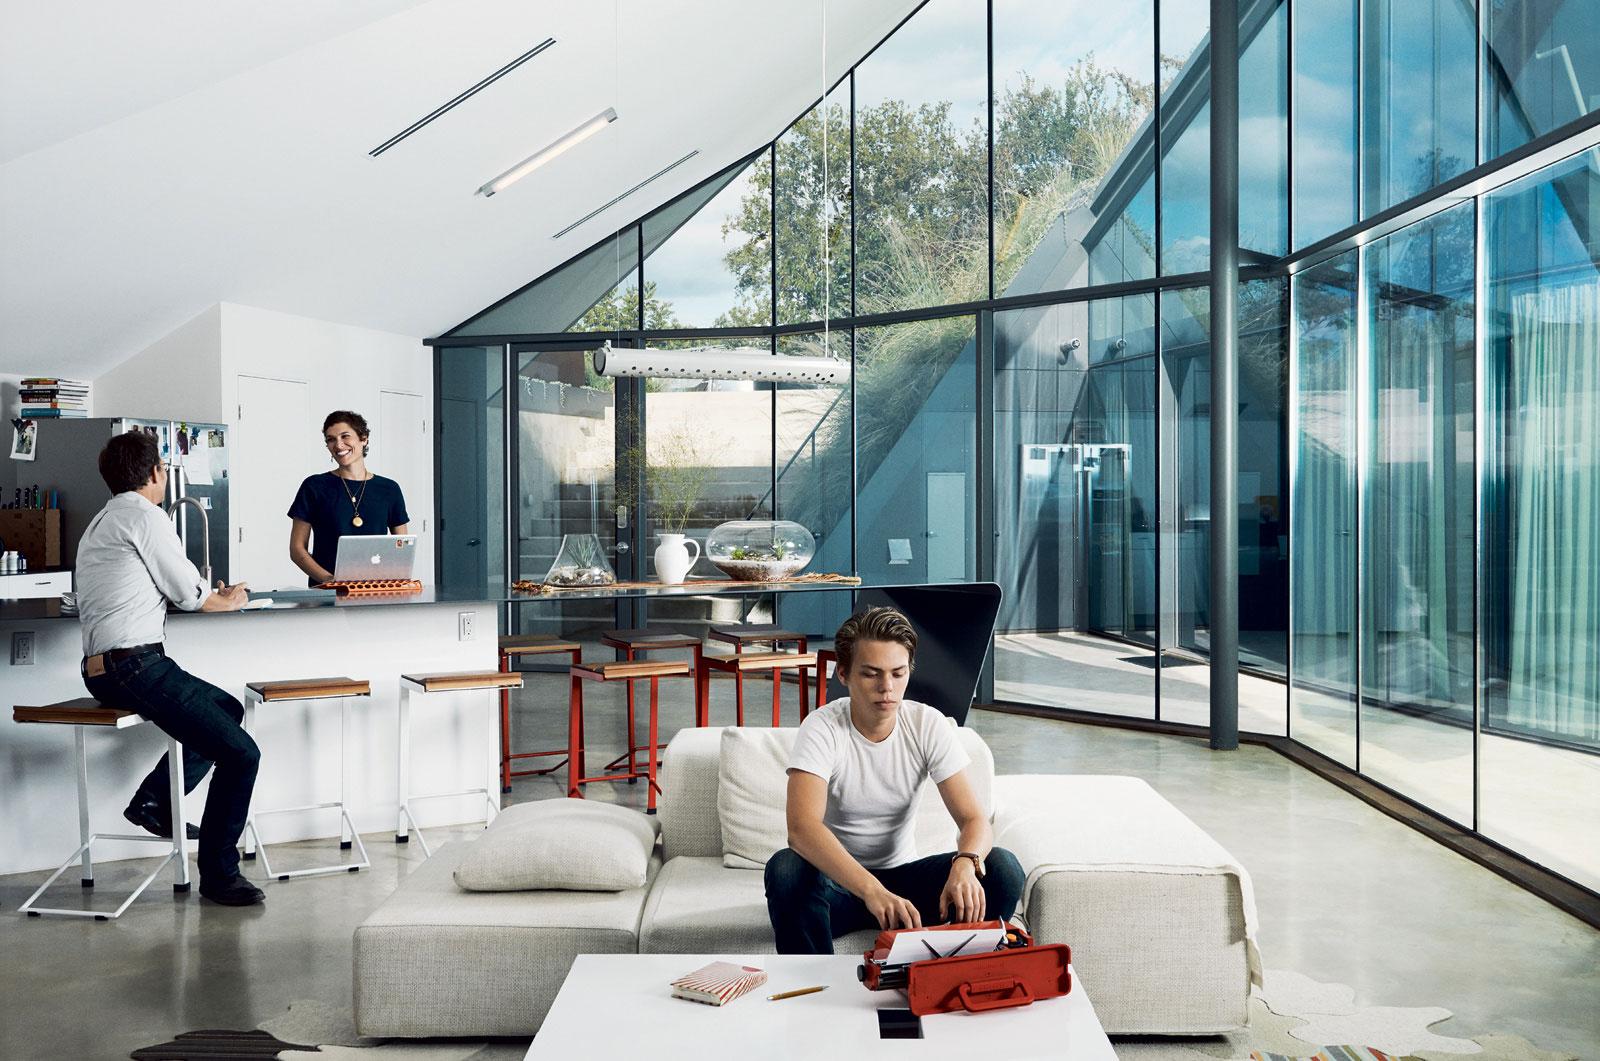 amazing kitchen gadgets renovation on a budget edgeland house / bercy chen studio | ideasgn